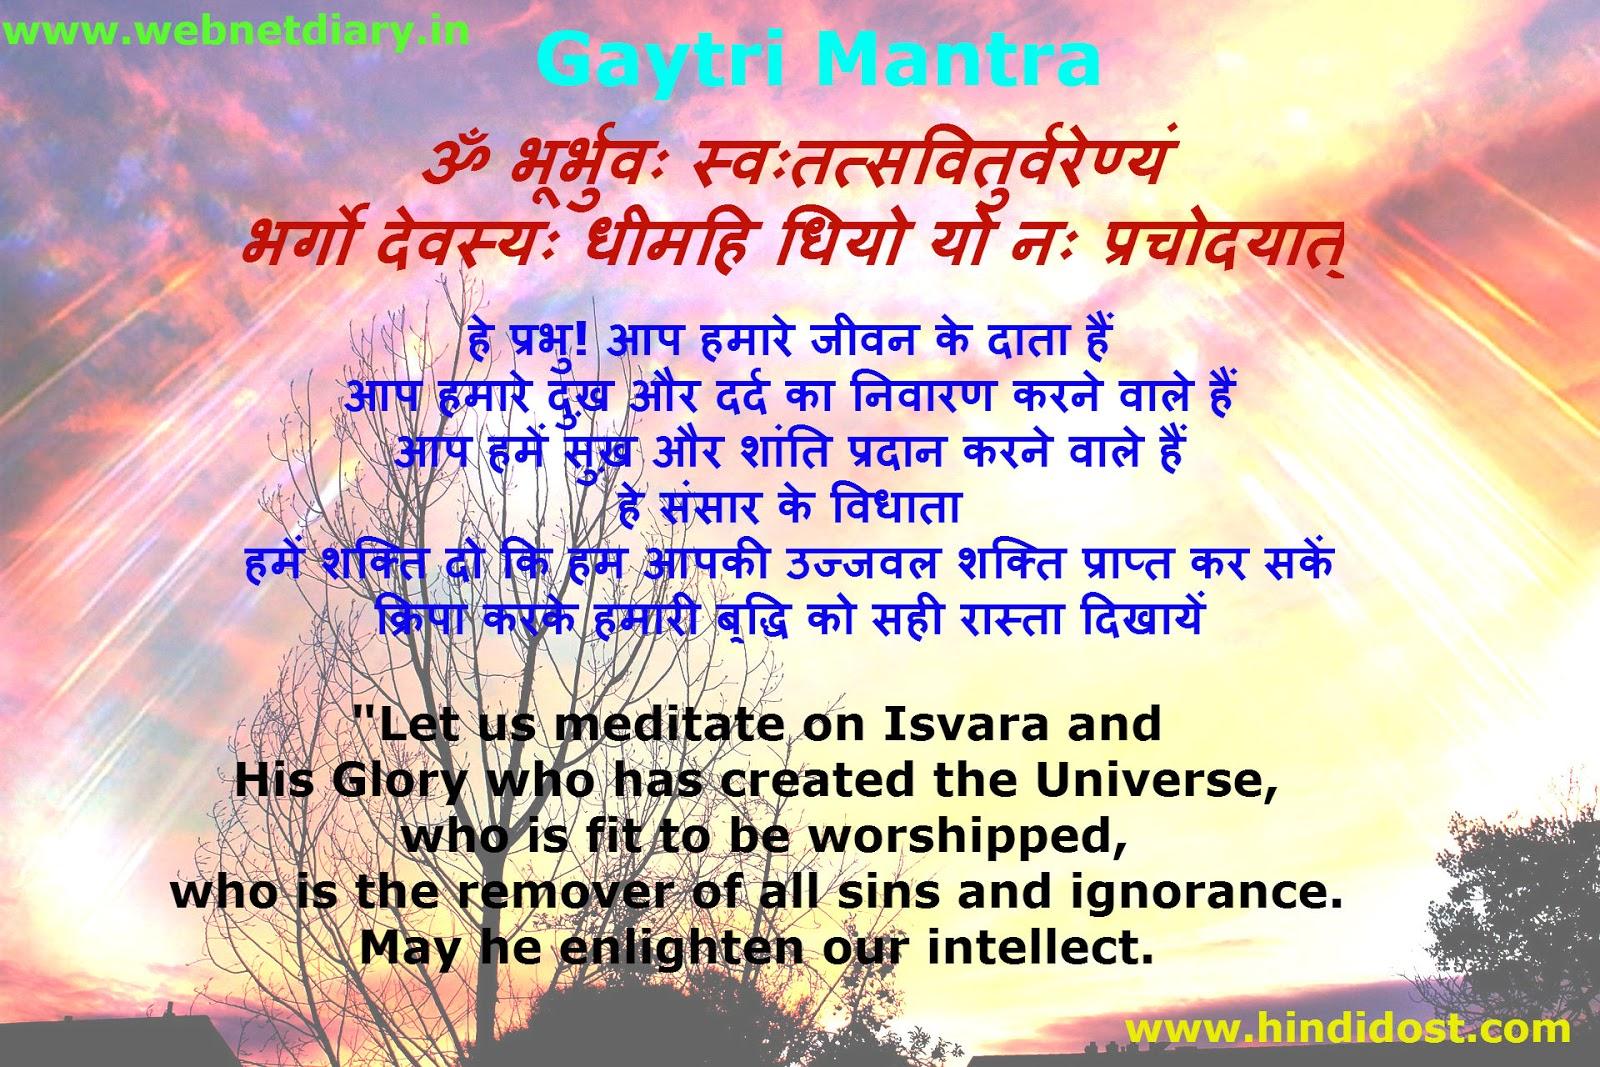 Gayatri Mantra meaning in Hindi and English | हिंदी दोस्त